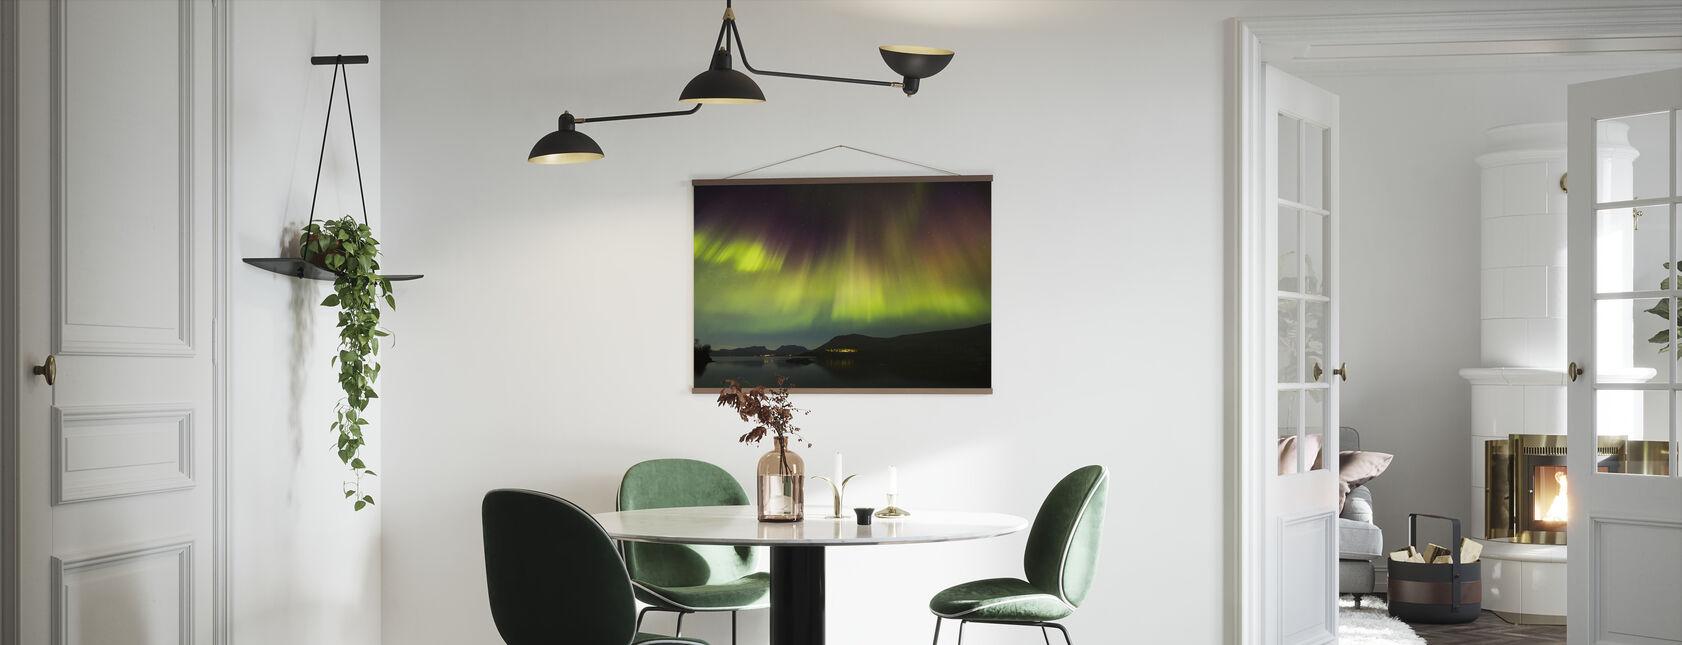 Northern Lights in Torneträsk - Sweden - Poster - Küchen